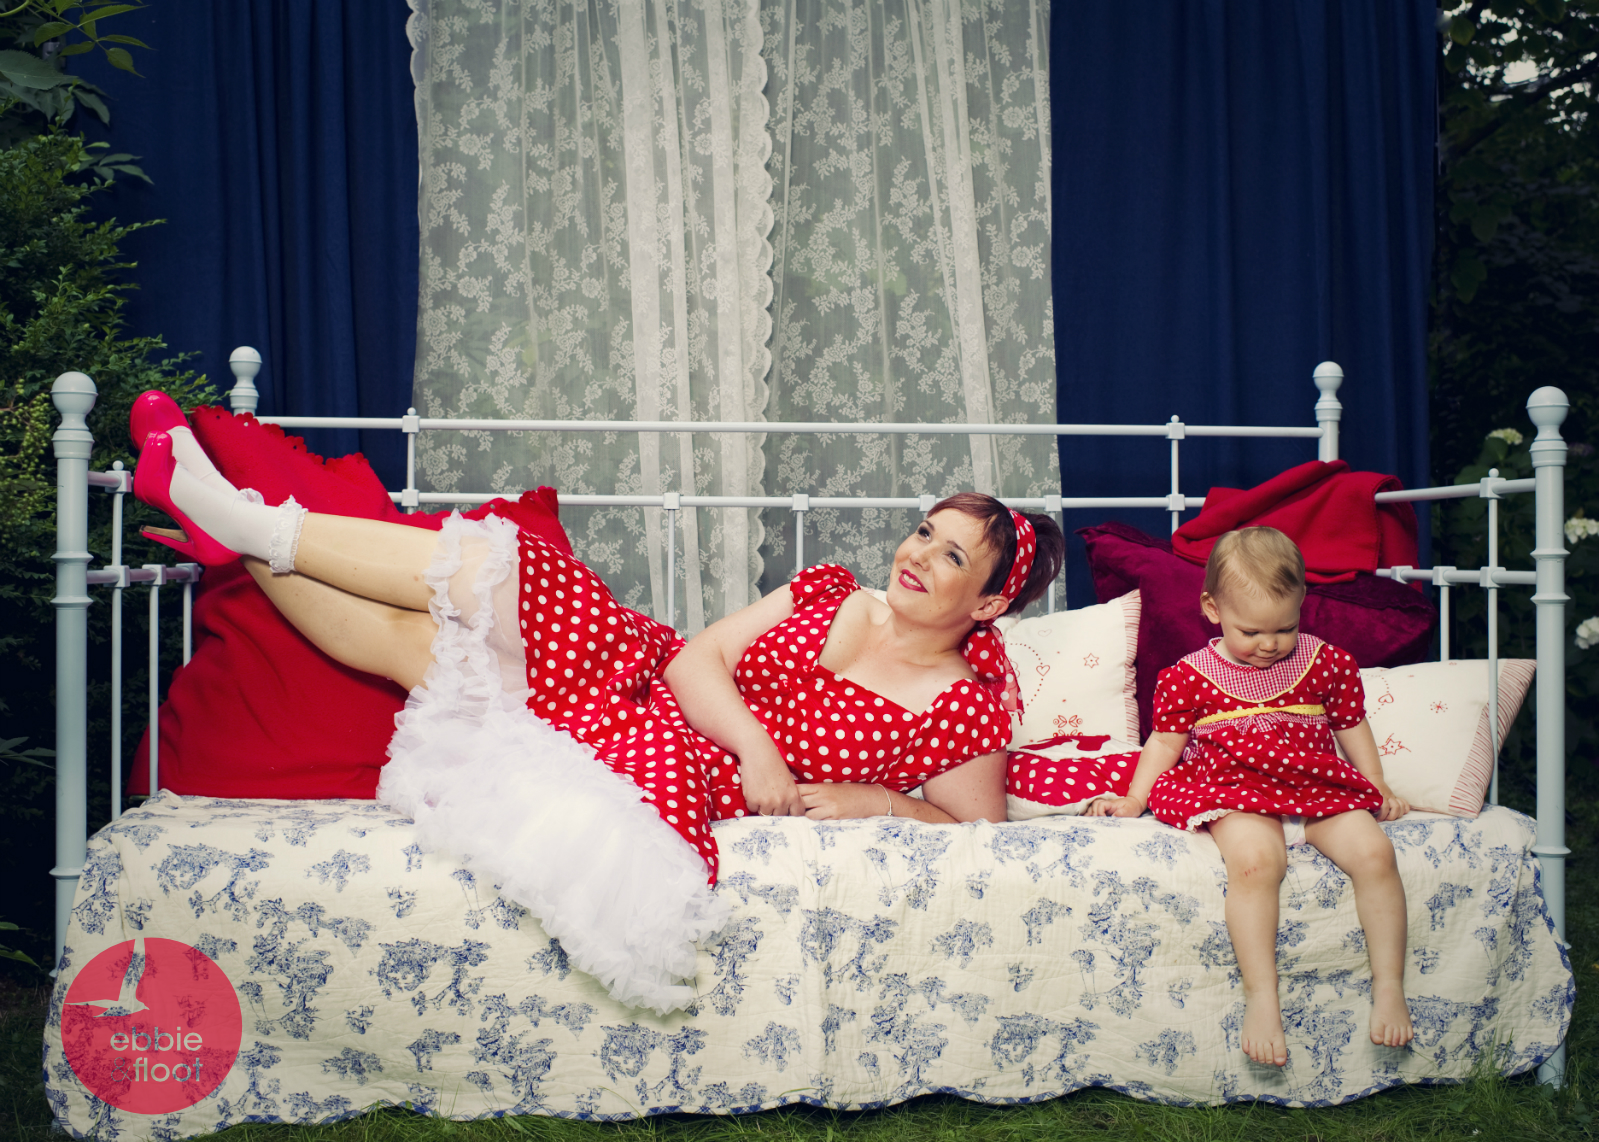 ebbie-dunf-floot_pelka-und-wilms_fotografie_Vintage_shabby_Petticoat_dots_Tellerock_top-vintage-mode